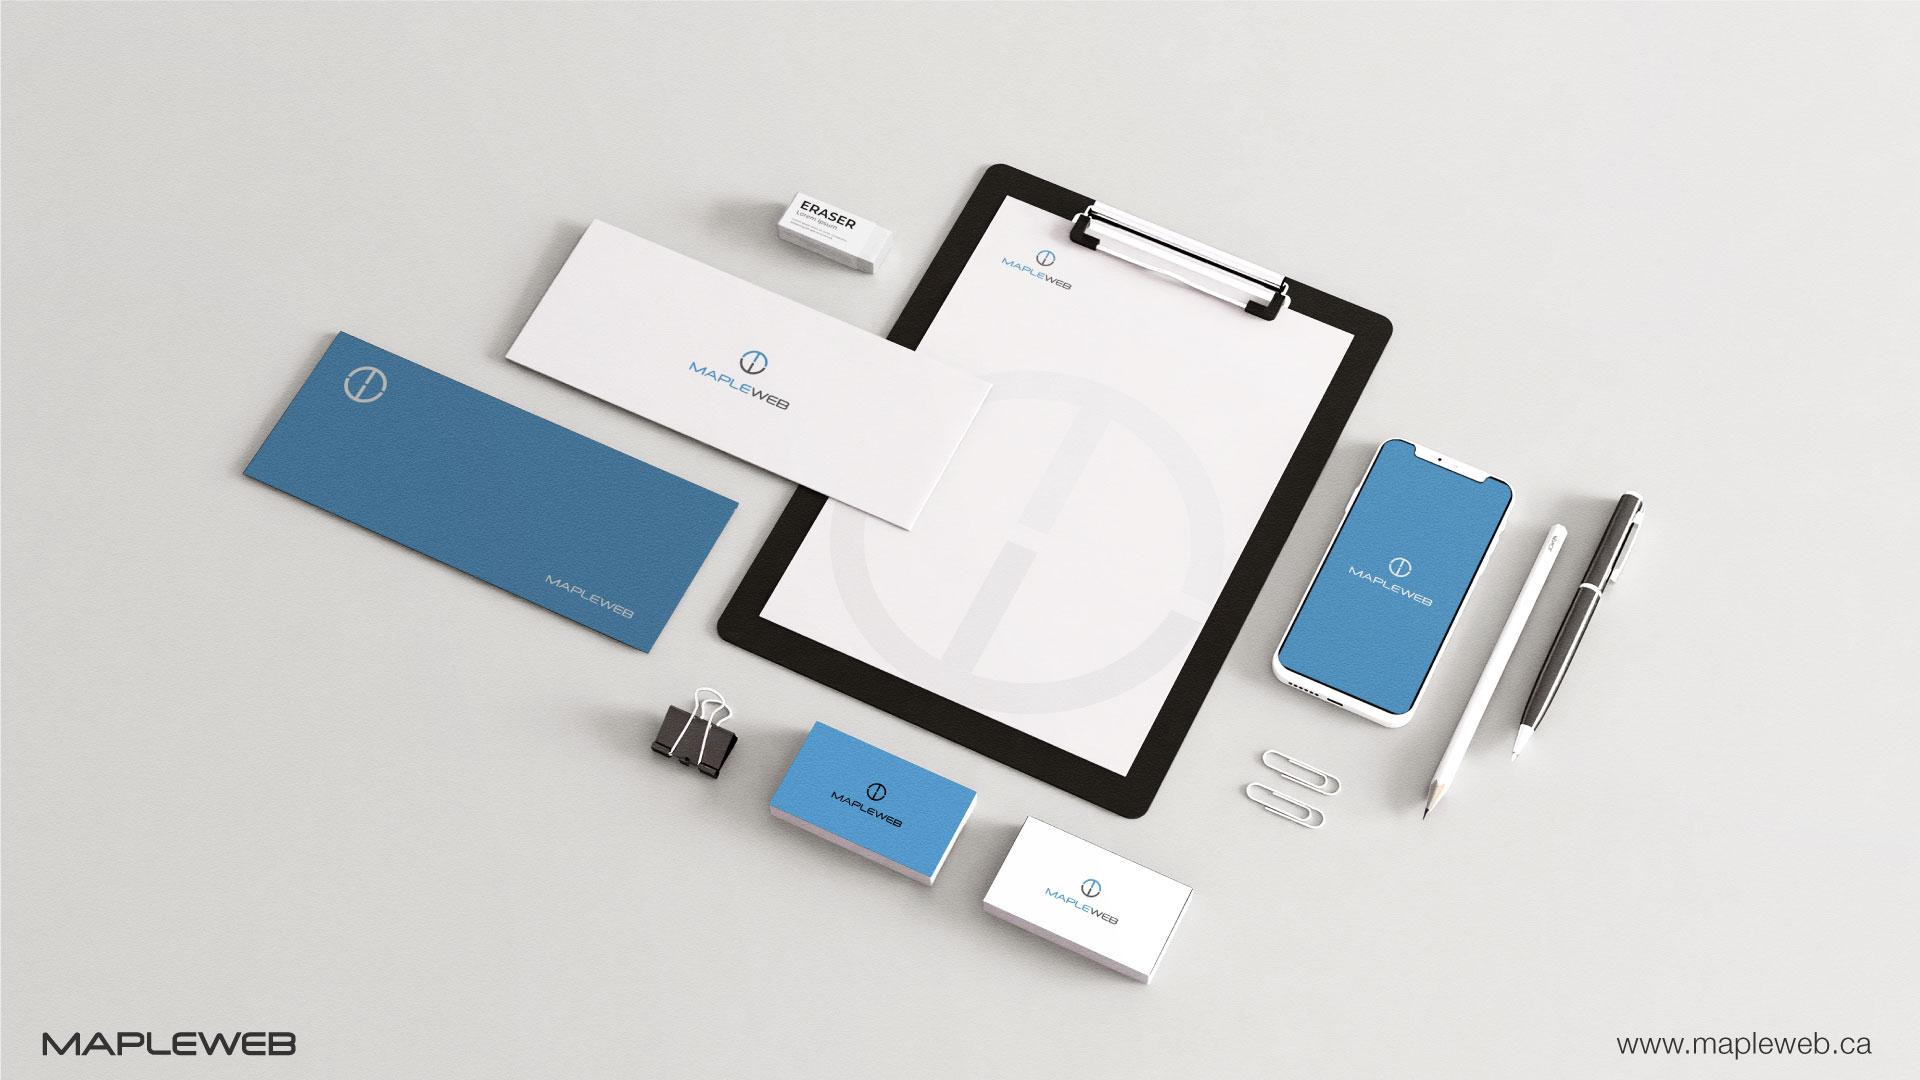 mapleweb-brand-logo-design-by-mapleweb-vancouver-canada-stationery-mock